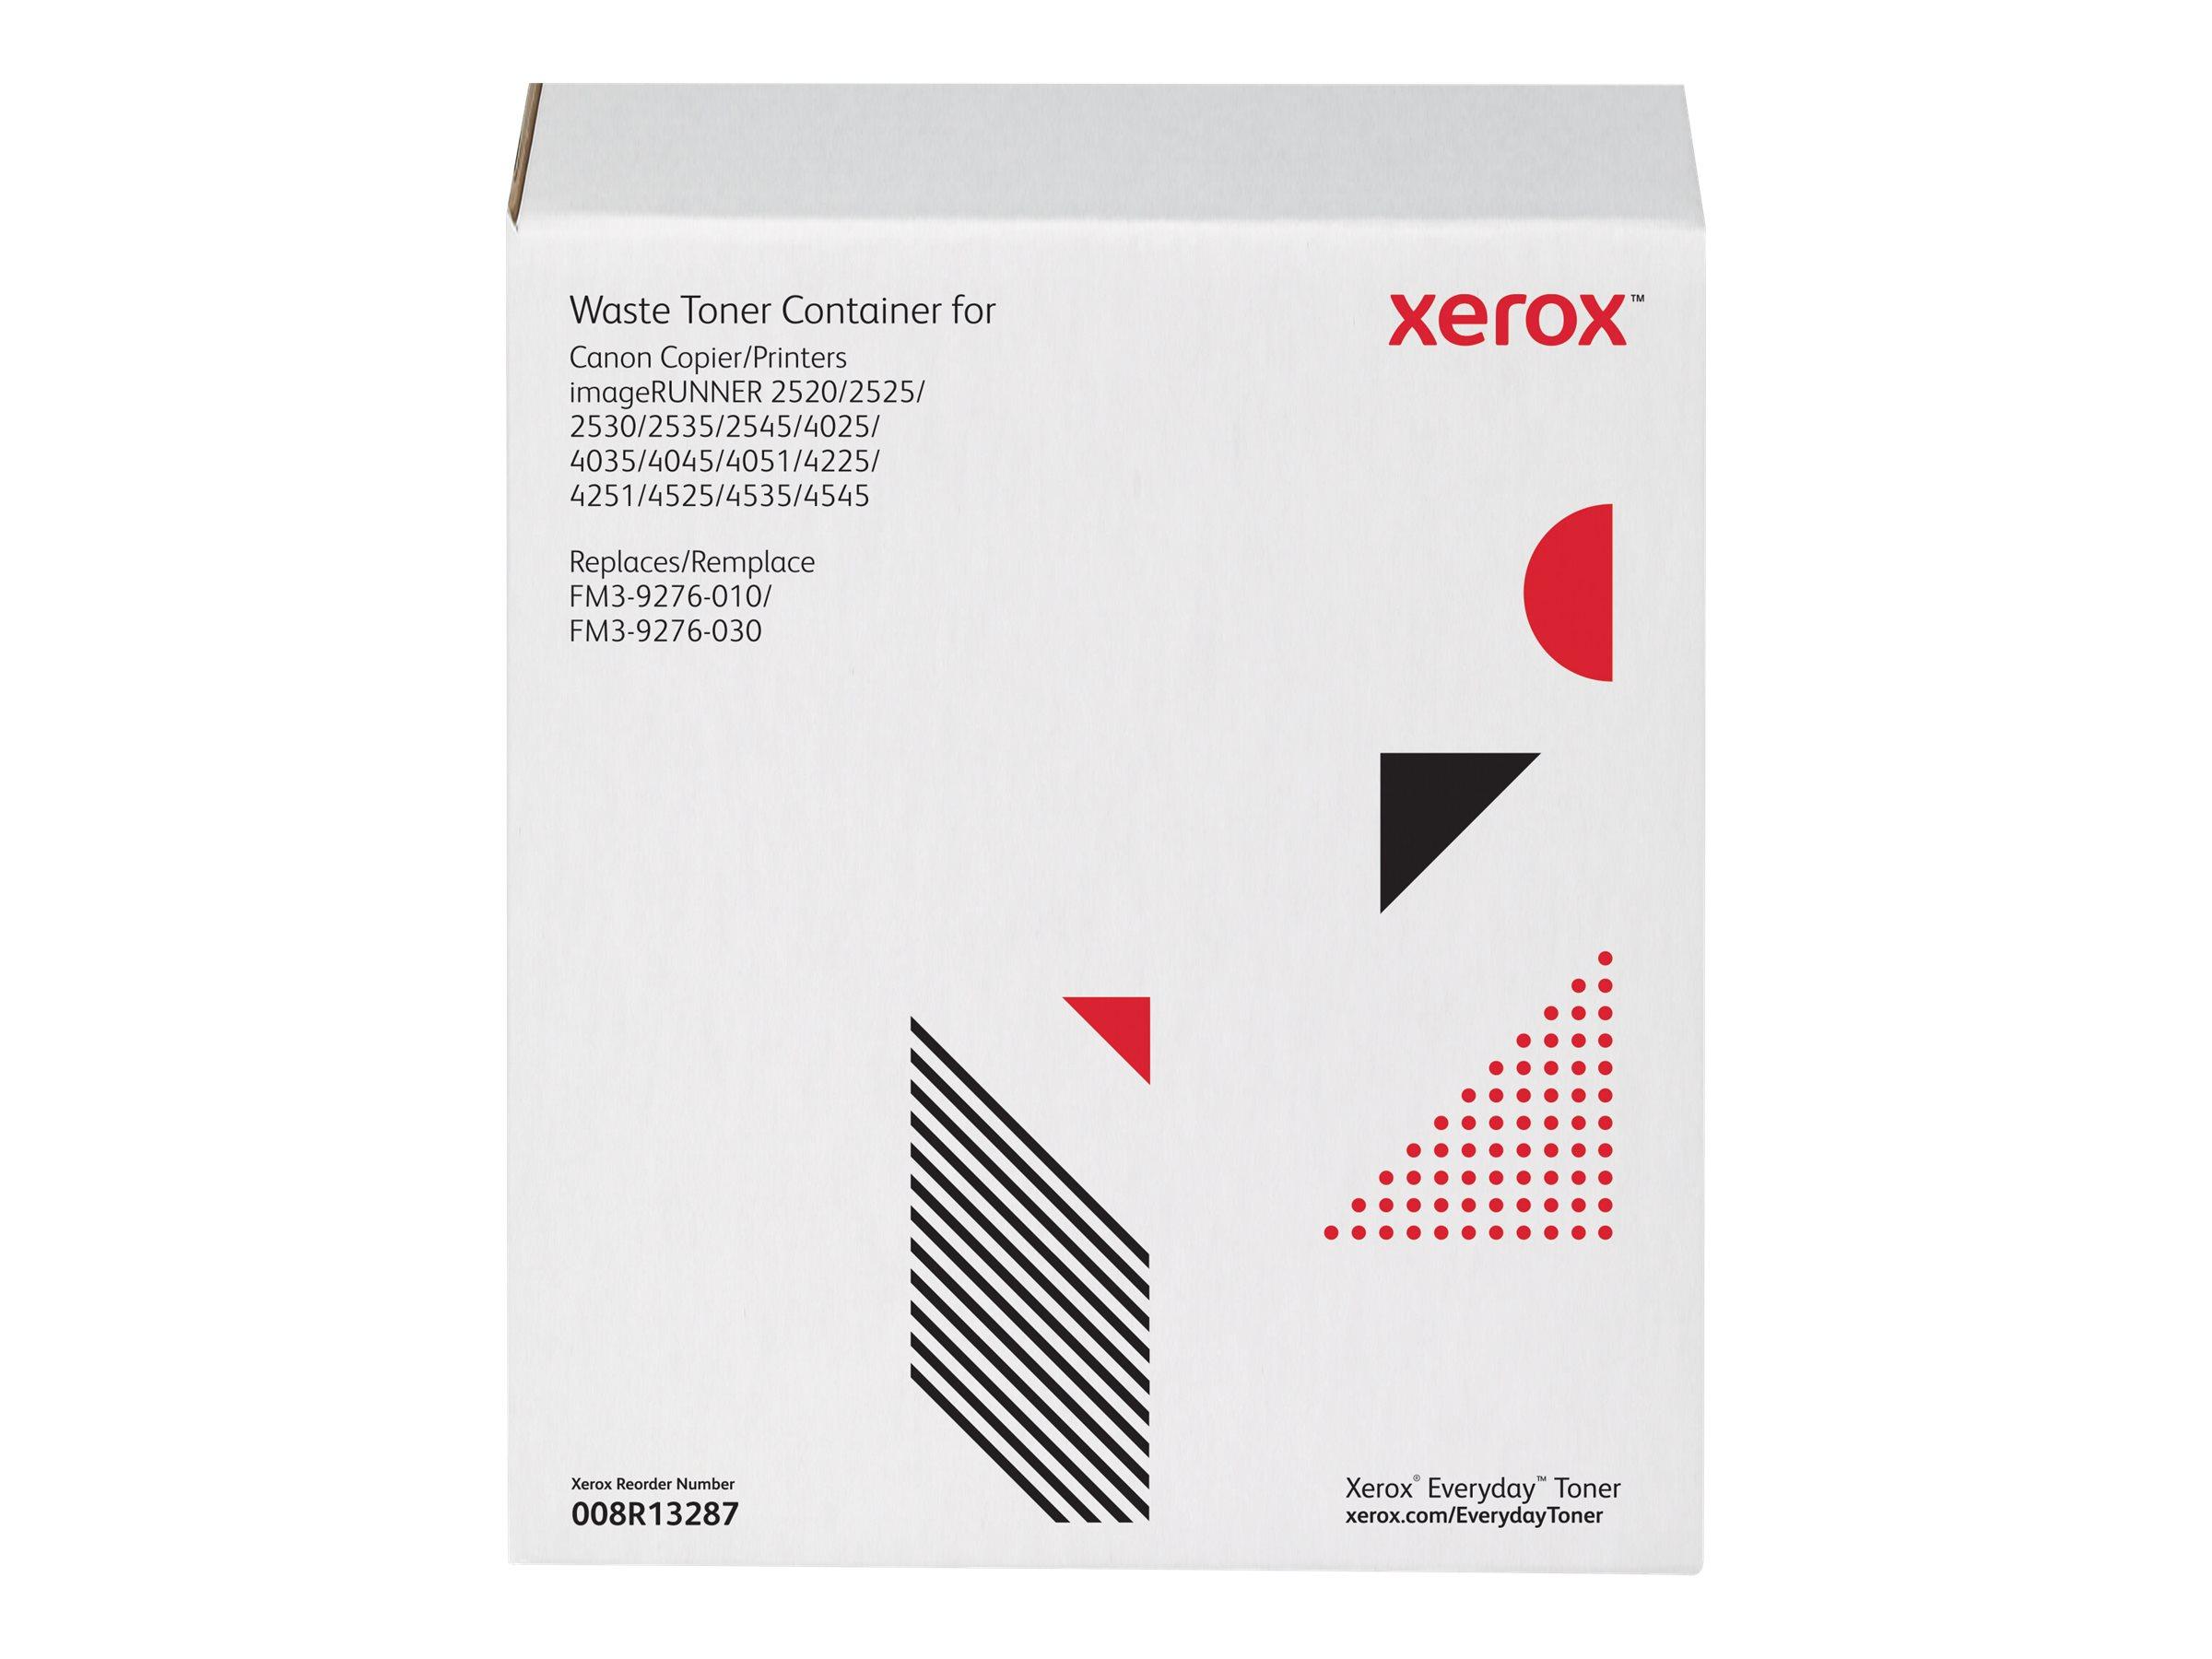 Xerox Everyday - waste toner collector